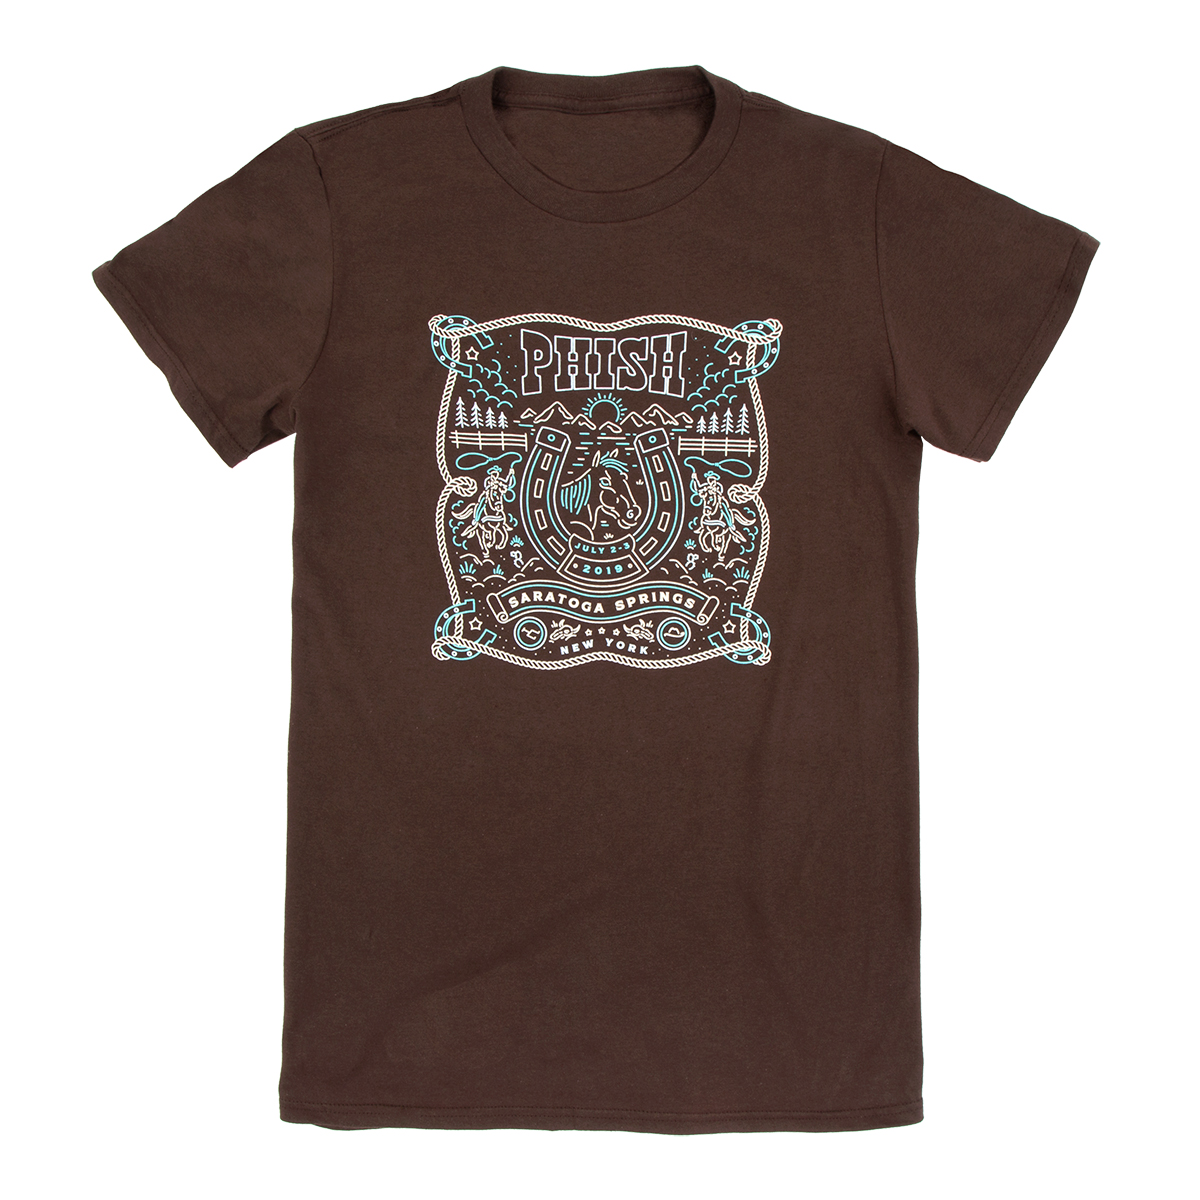 Saratoga Springs Event T-shirt